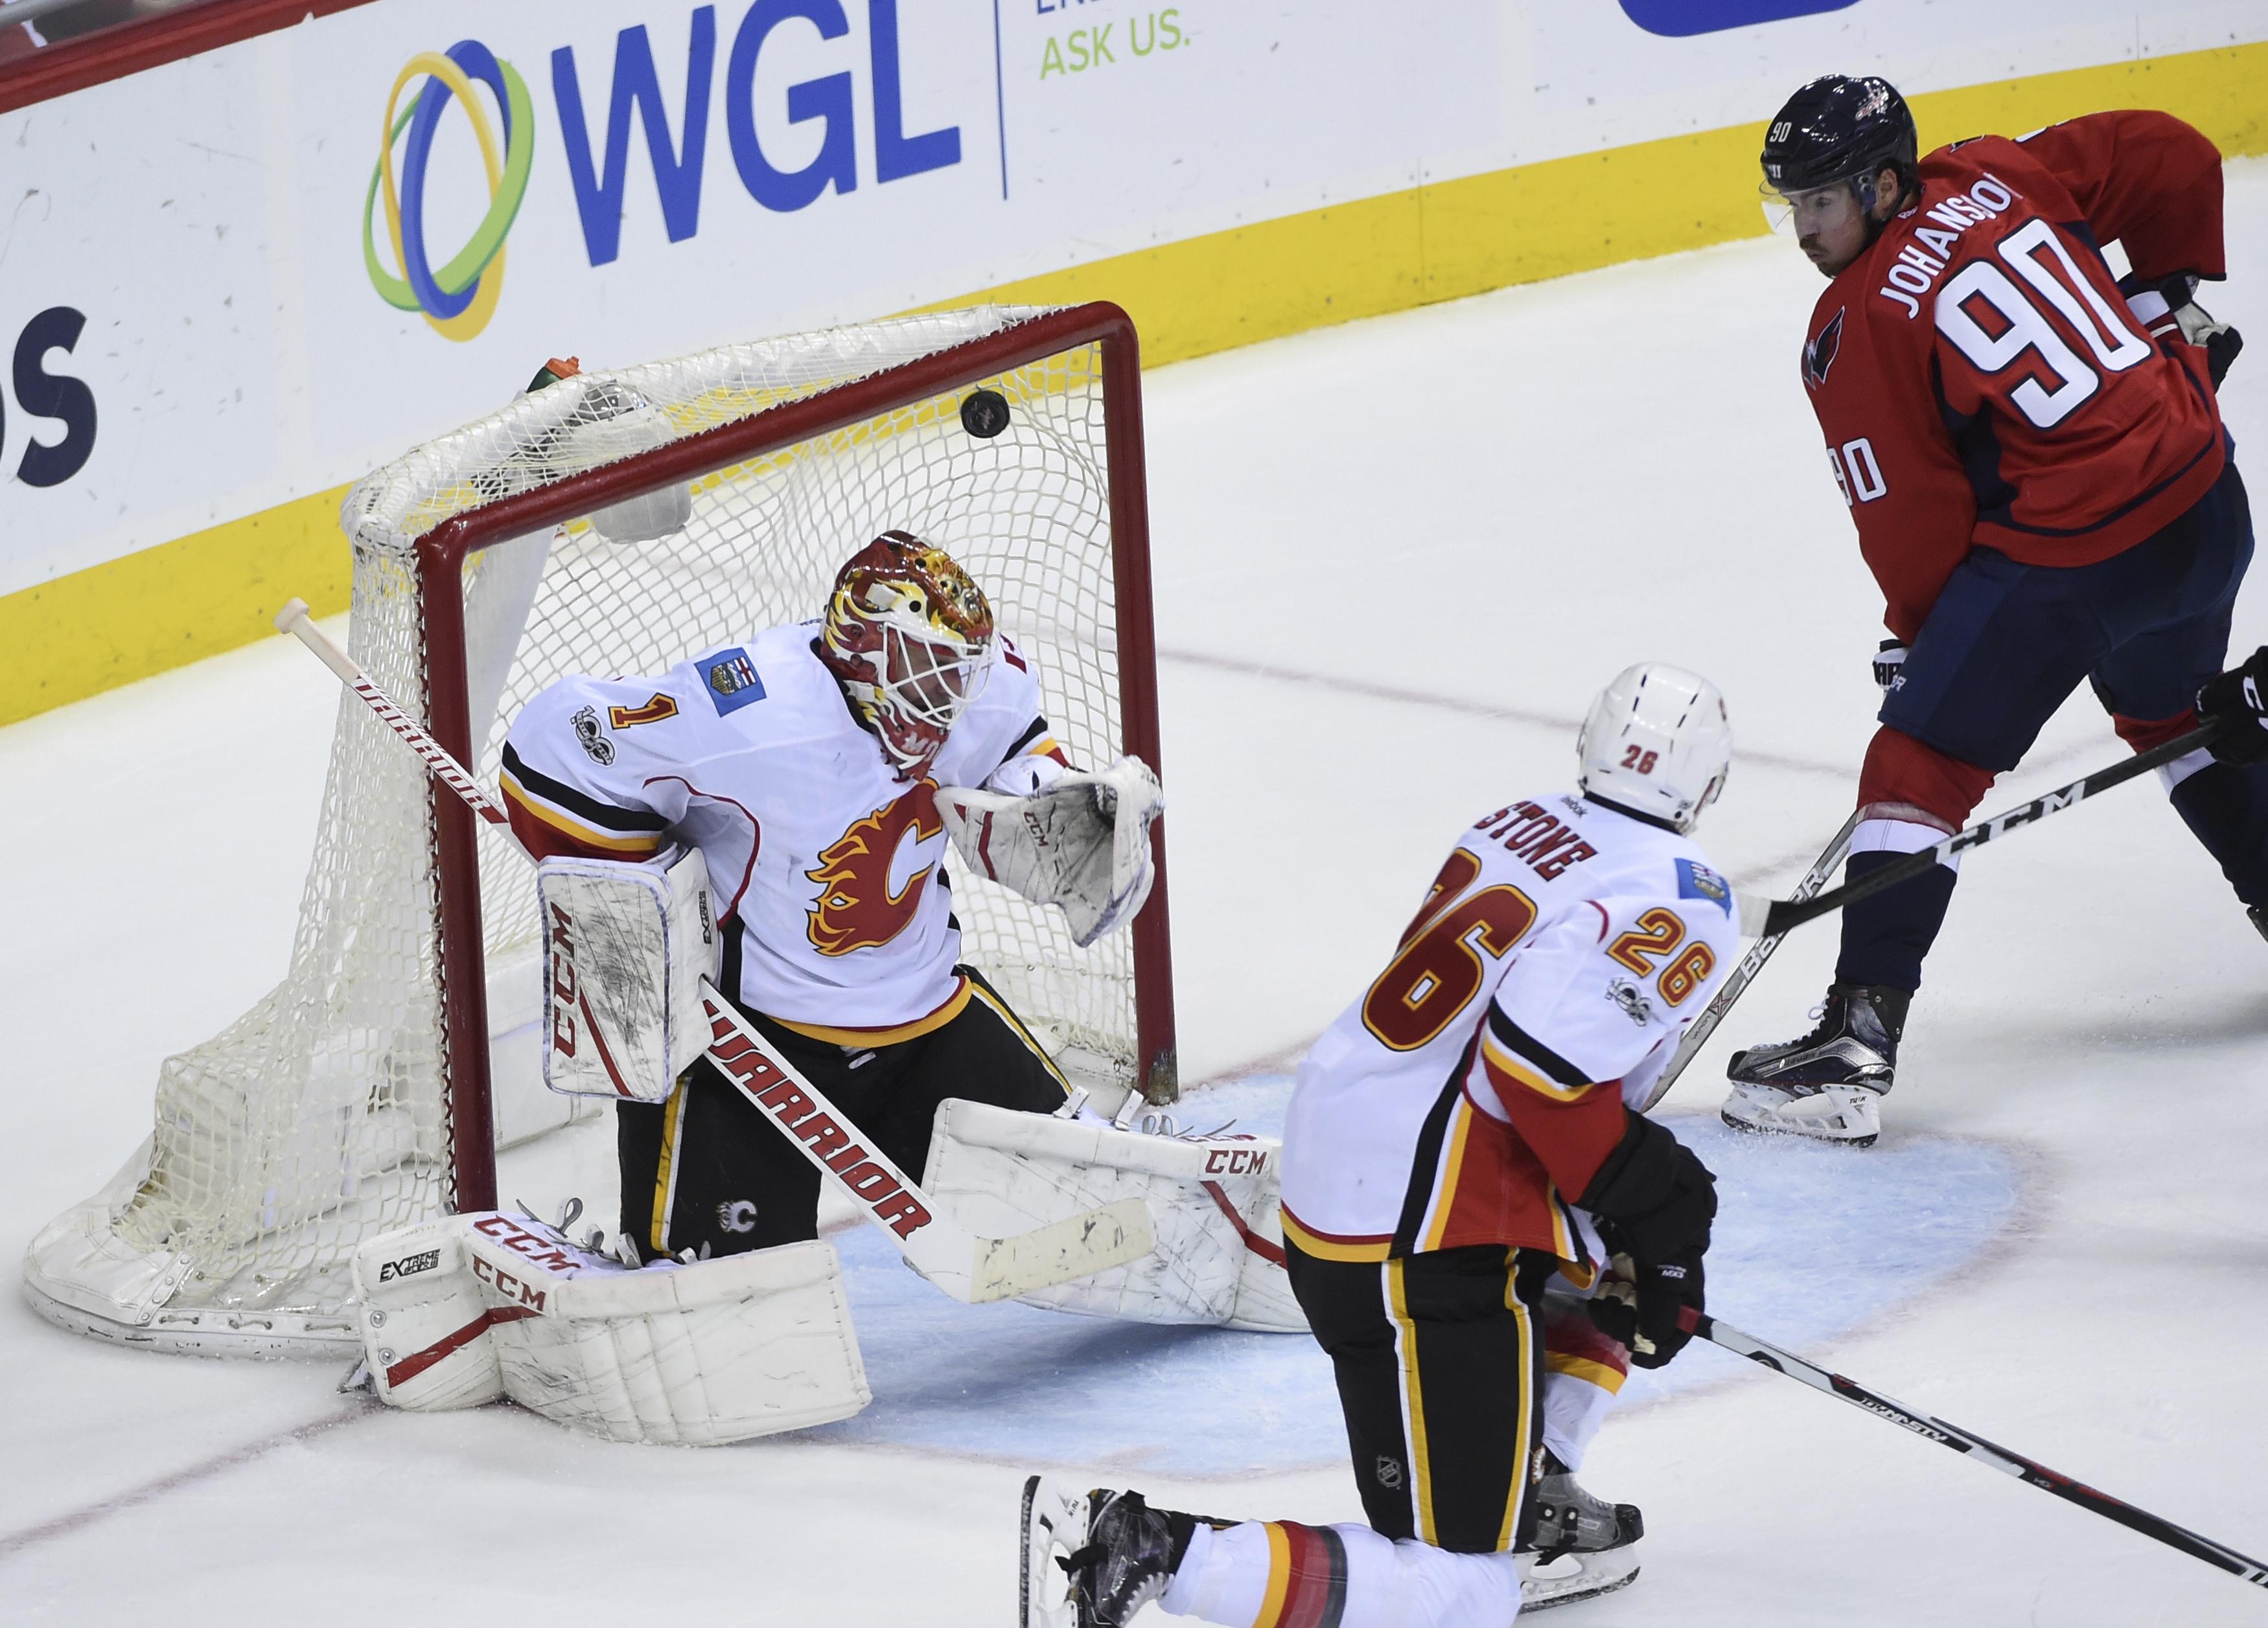 Flames_capitals_hockey_13598.jpg-a55c4